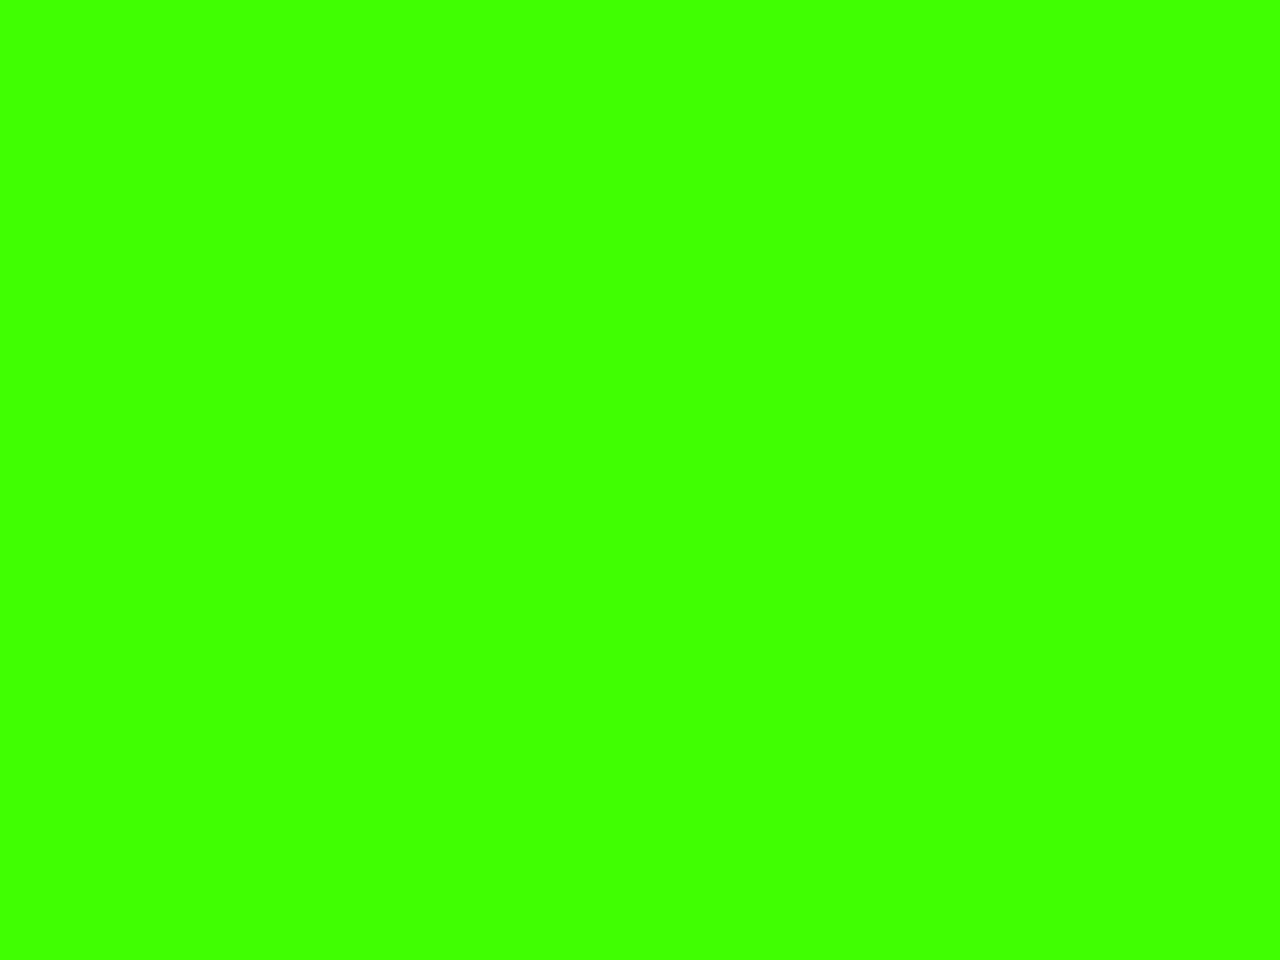 1280x960 Harlequin Solid Color Background